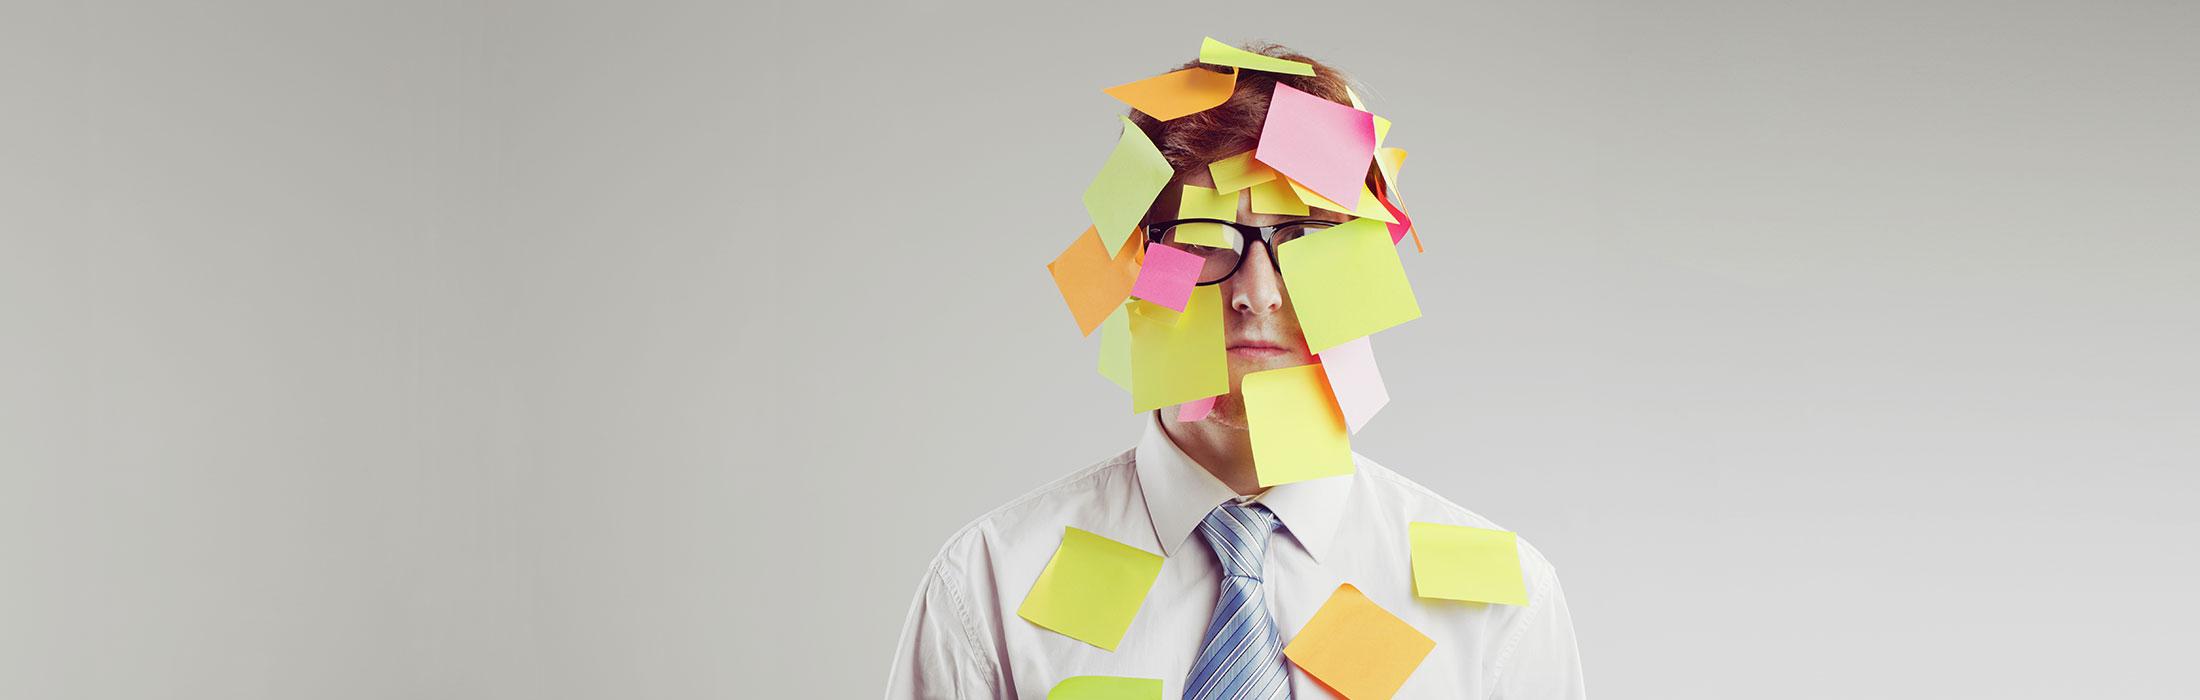 Stressmanagment